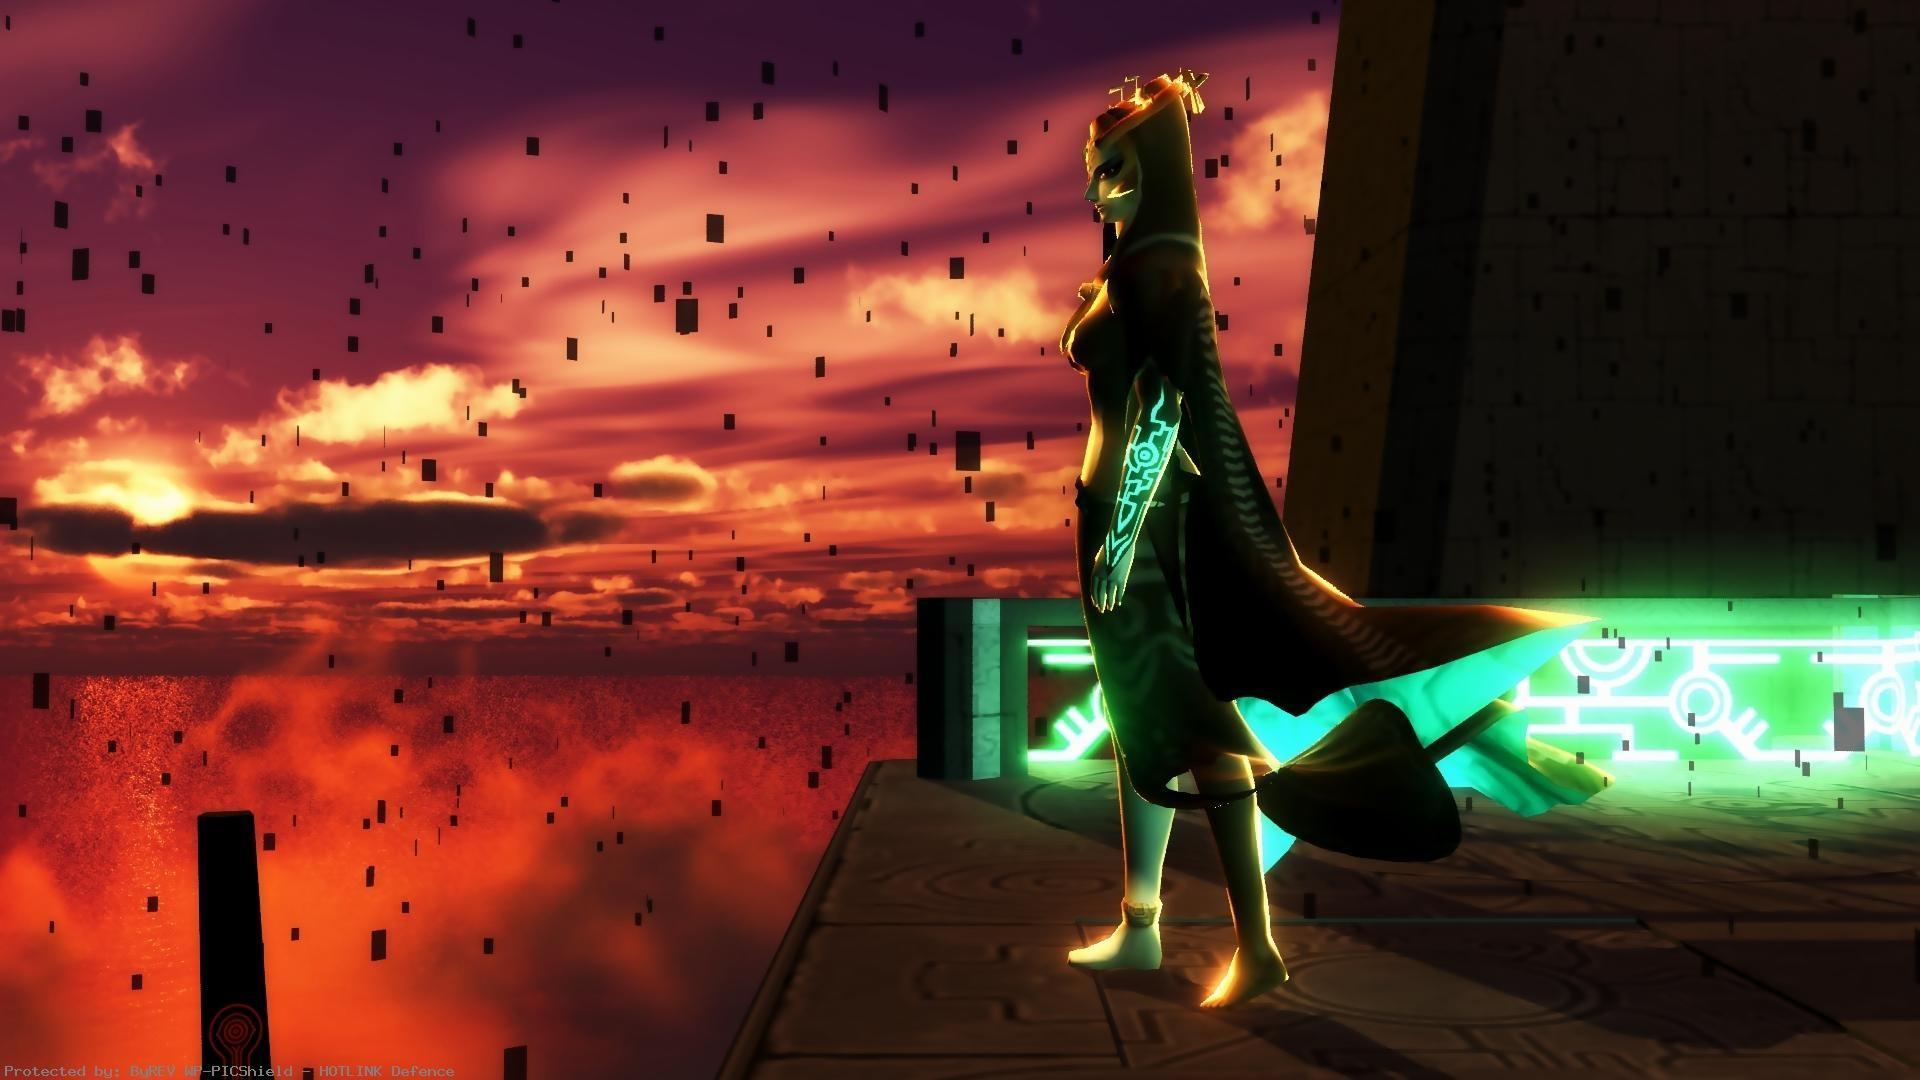 Video-Game-The-Legend-Of-Zelda-Twilight-Princess-